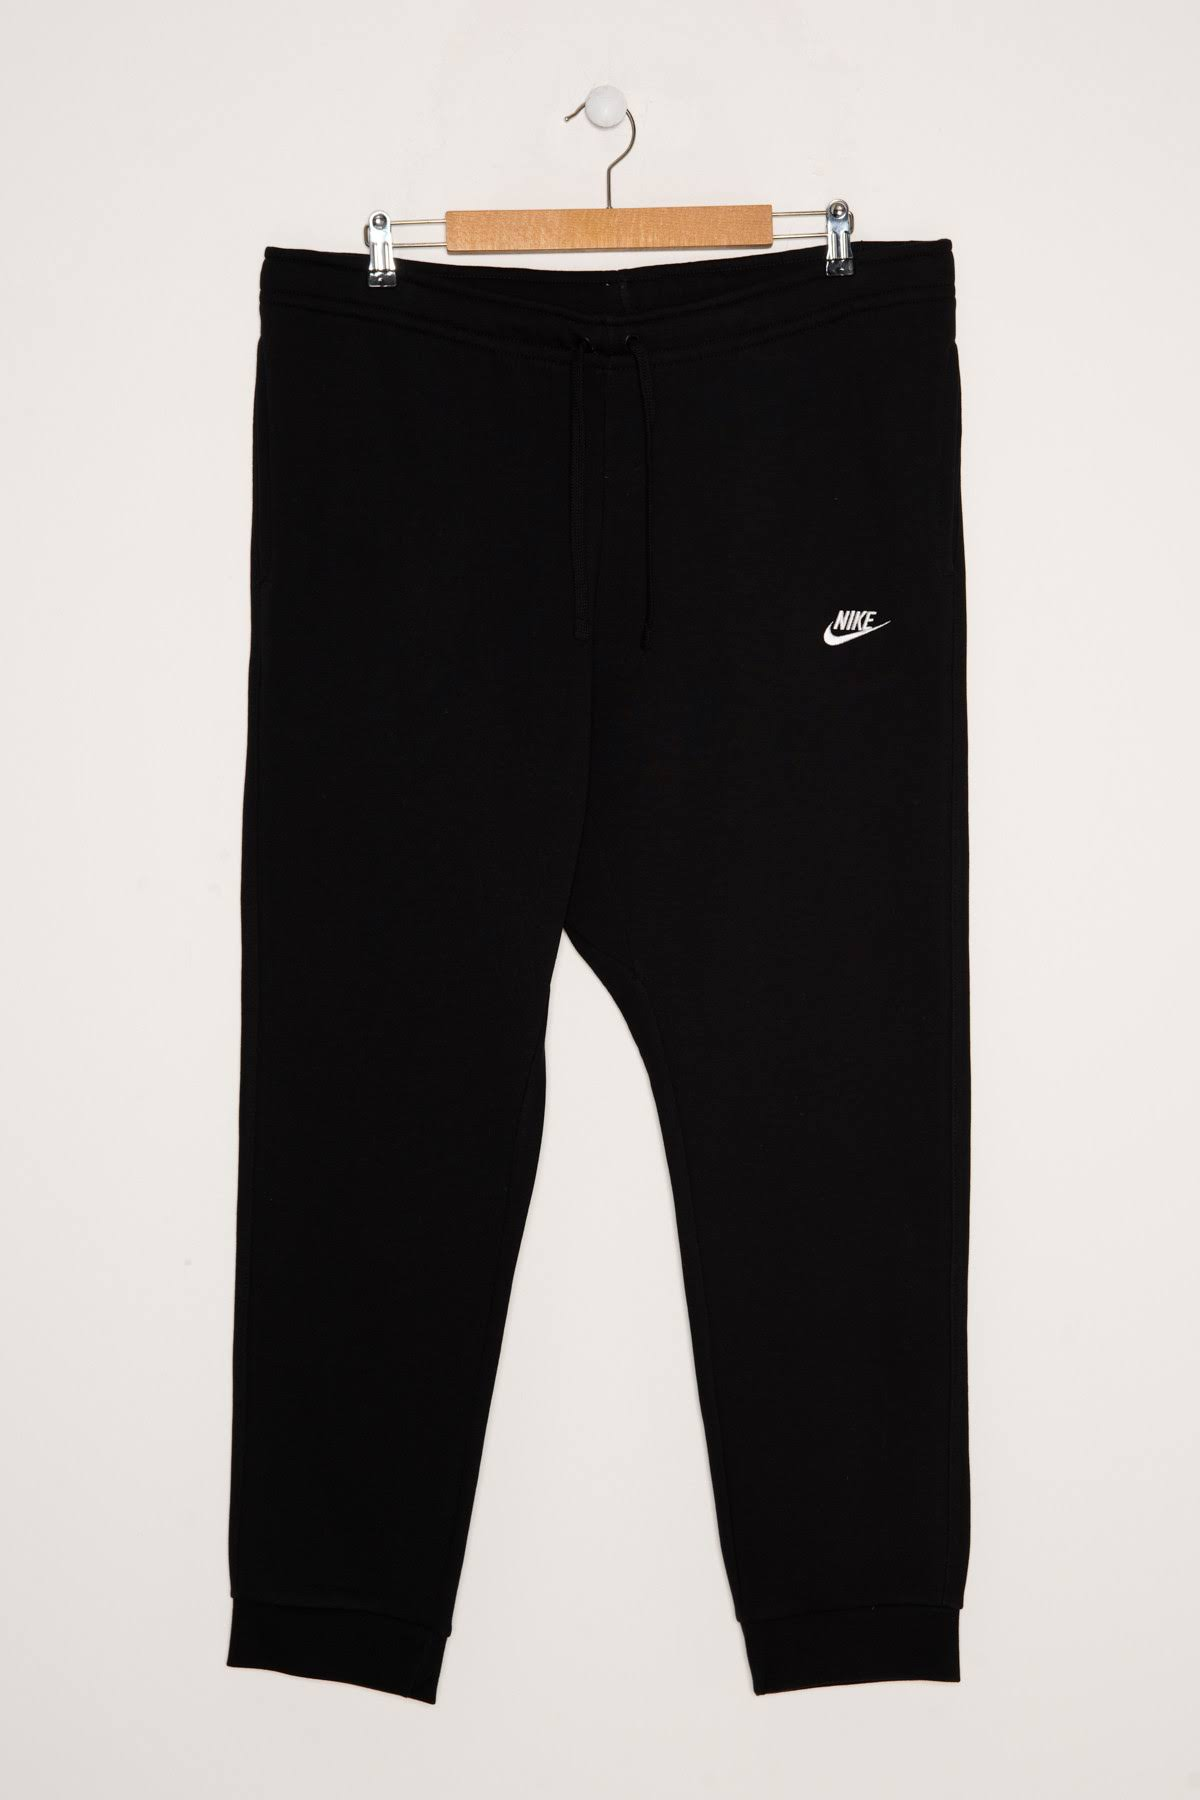 Fleece Altı Siyah Jogger Erkek 804408 Club Nike 010 Eşofman Ex6aYg6w